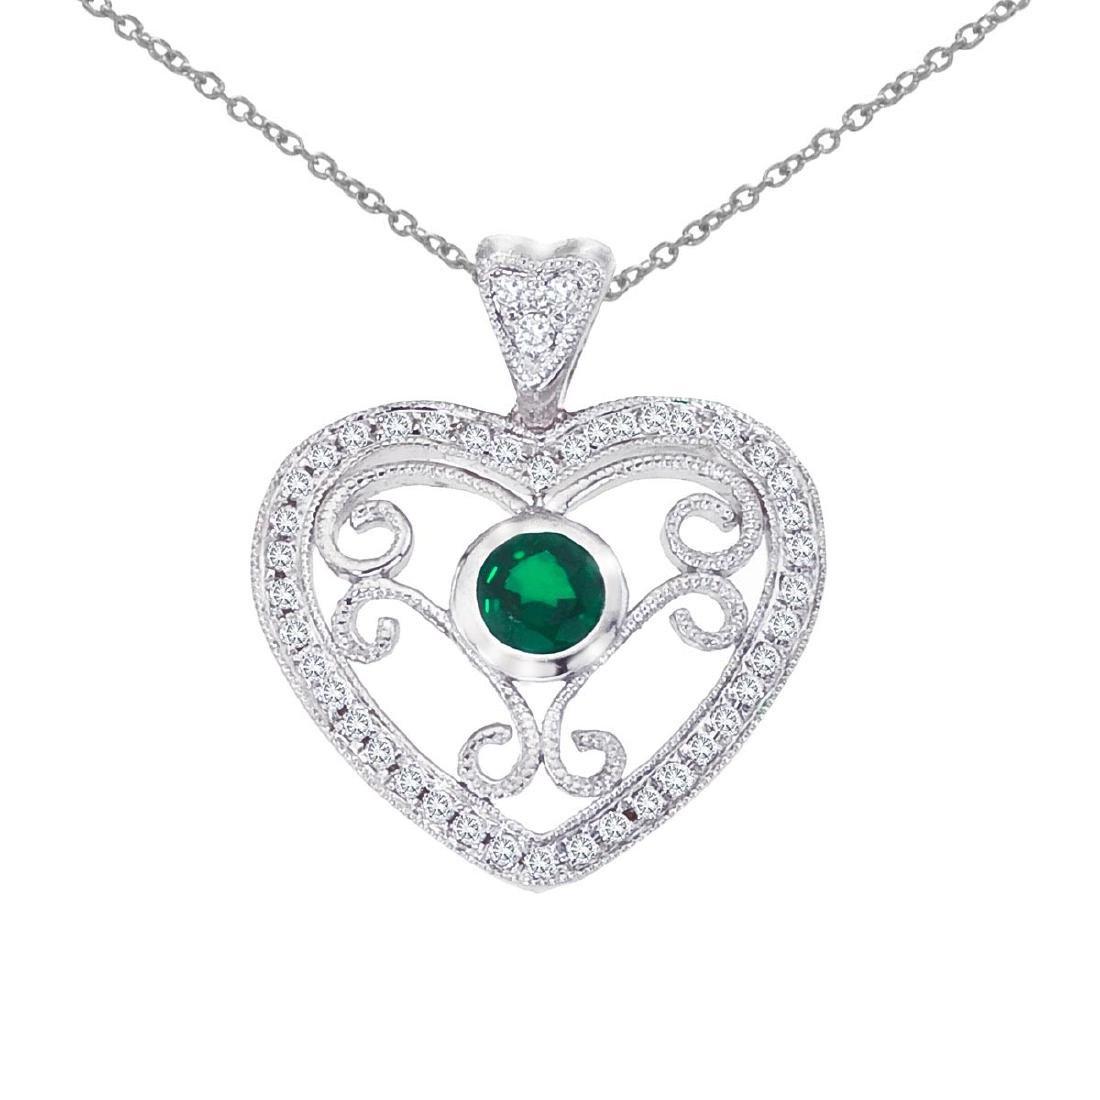 Certified 14k White Gold Heart Shaped Filigree Emerald